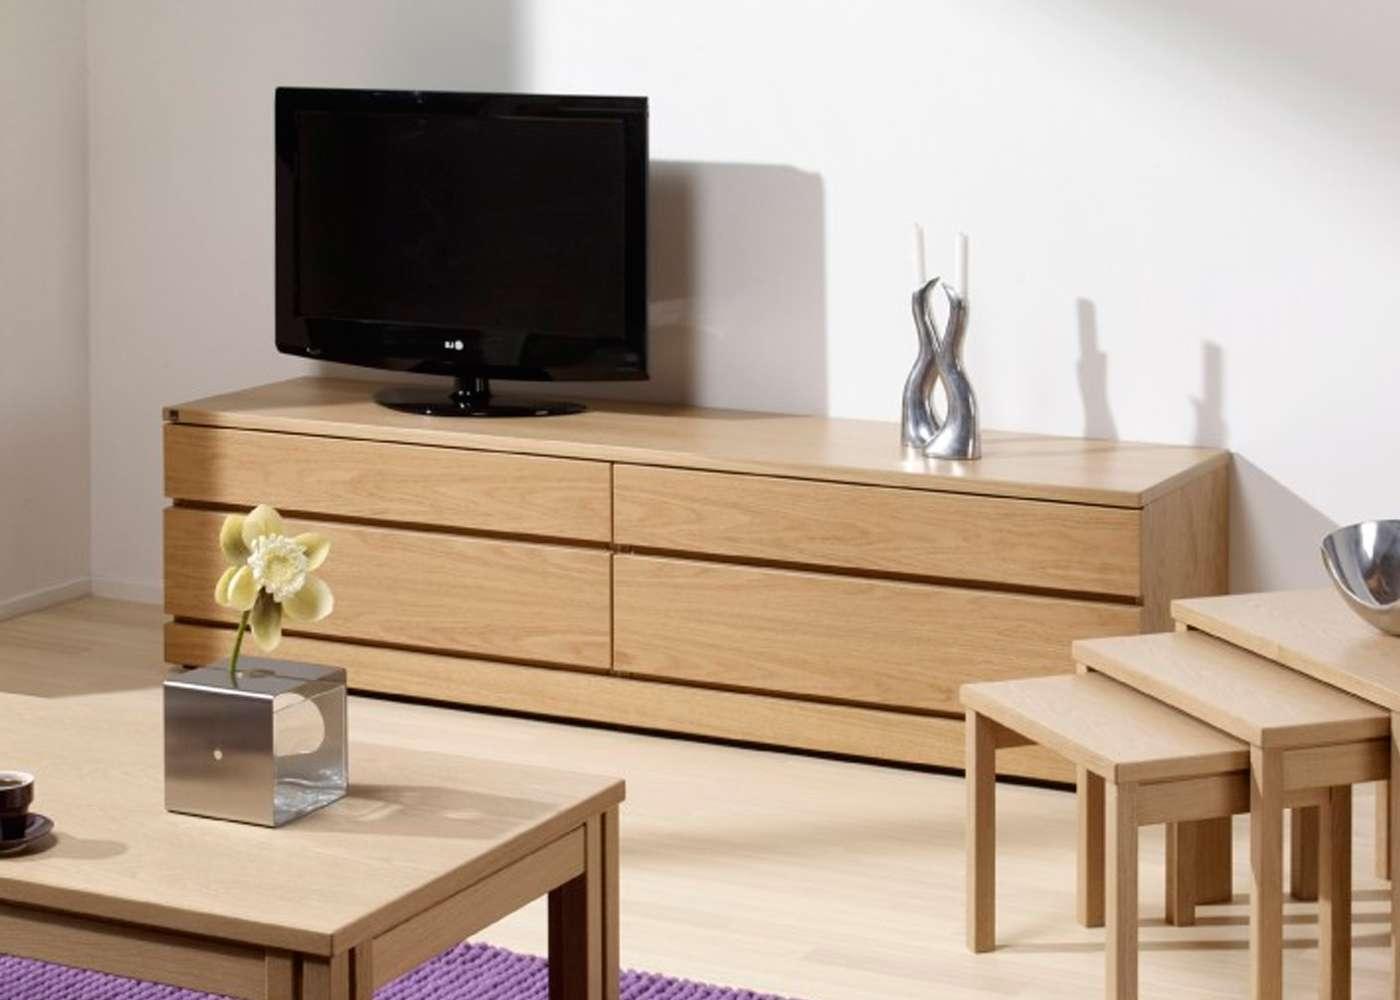 Skovby Sm87 Tv Cabinet In Light Oak Finish 1 – Midfurn Furniture In Light Oak Tv Cabinets (View 14 of 20)